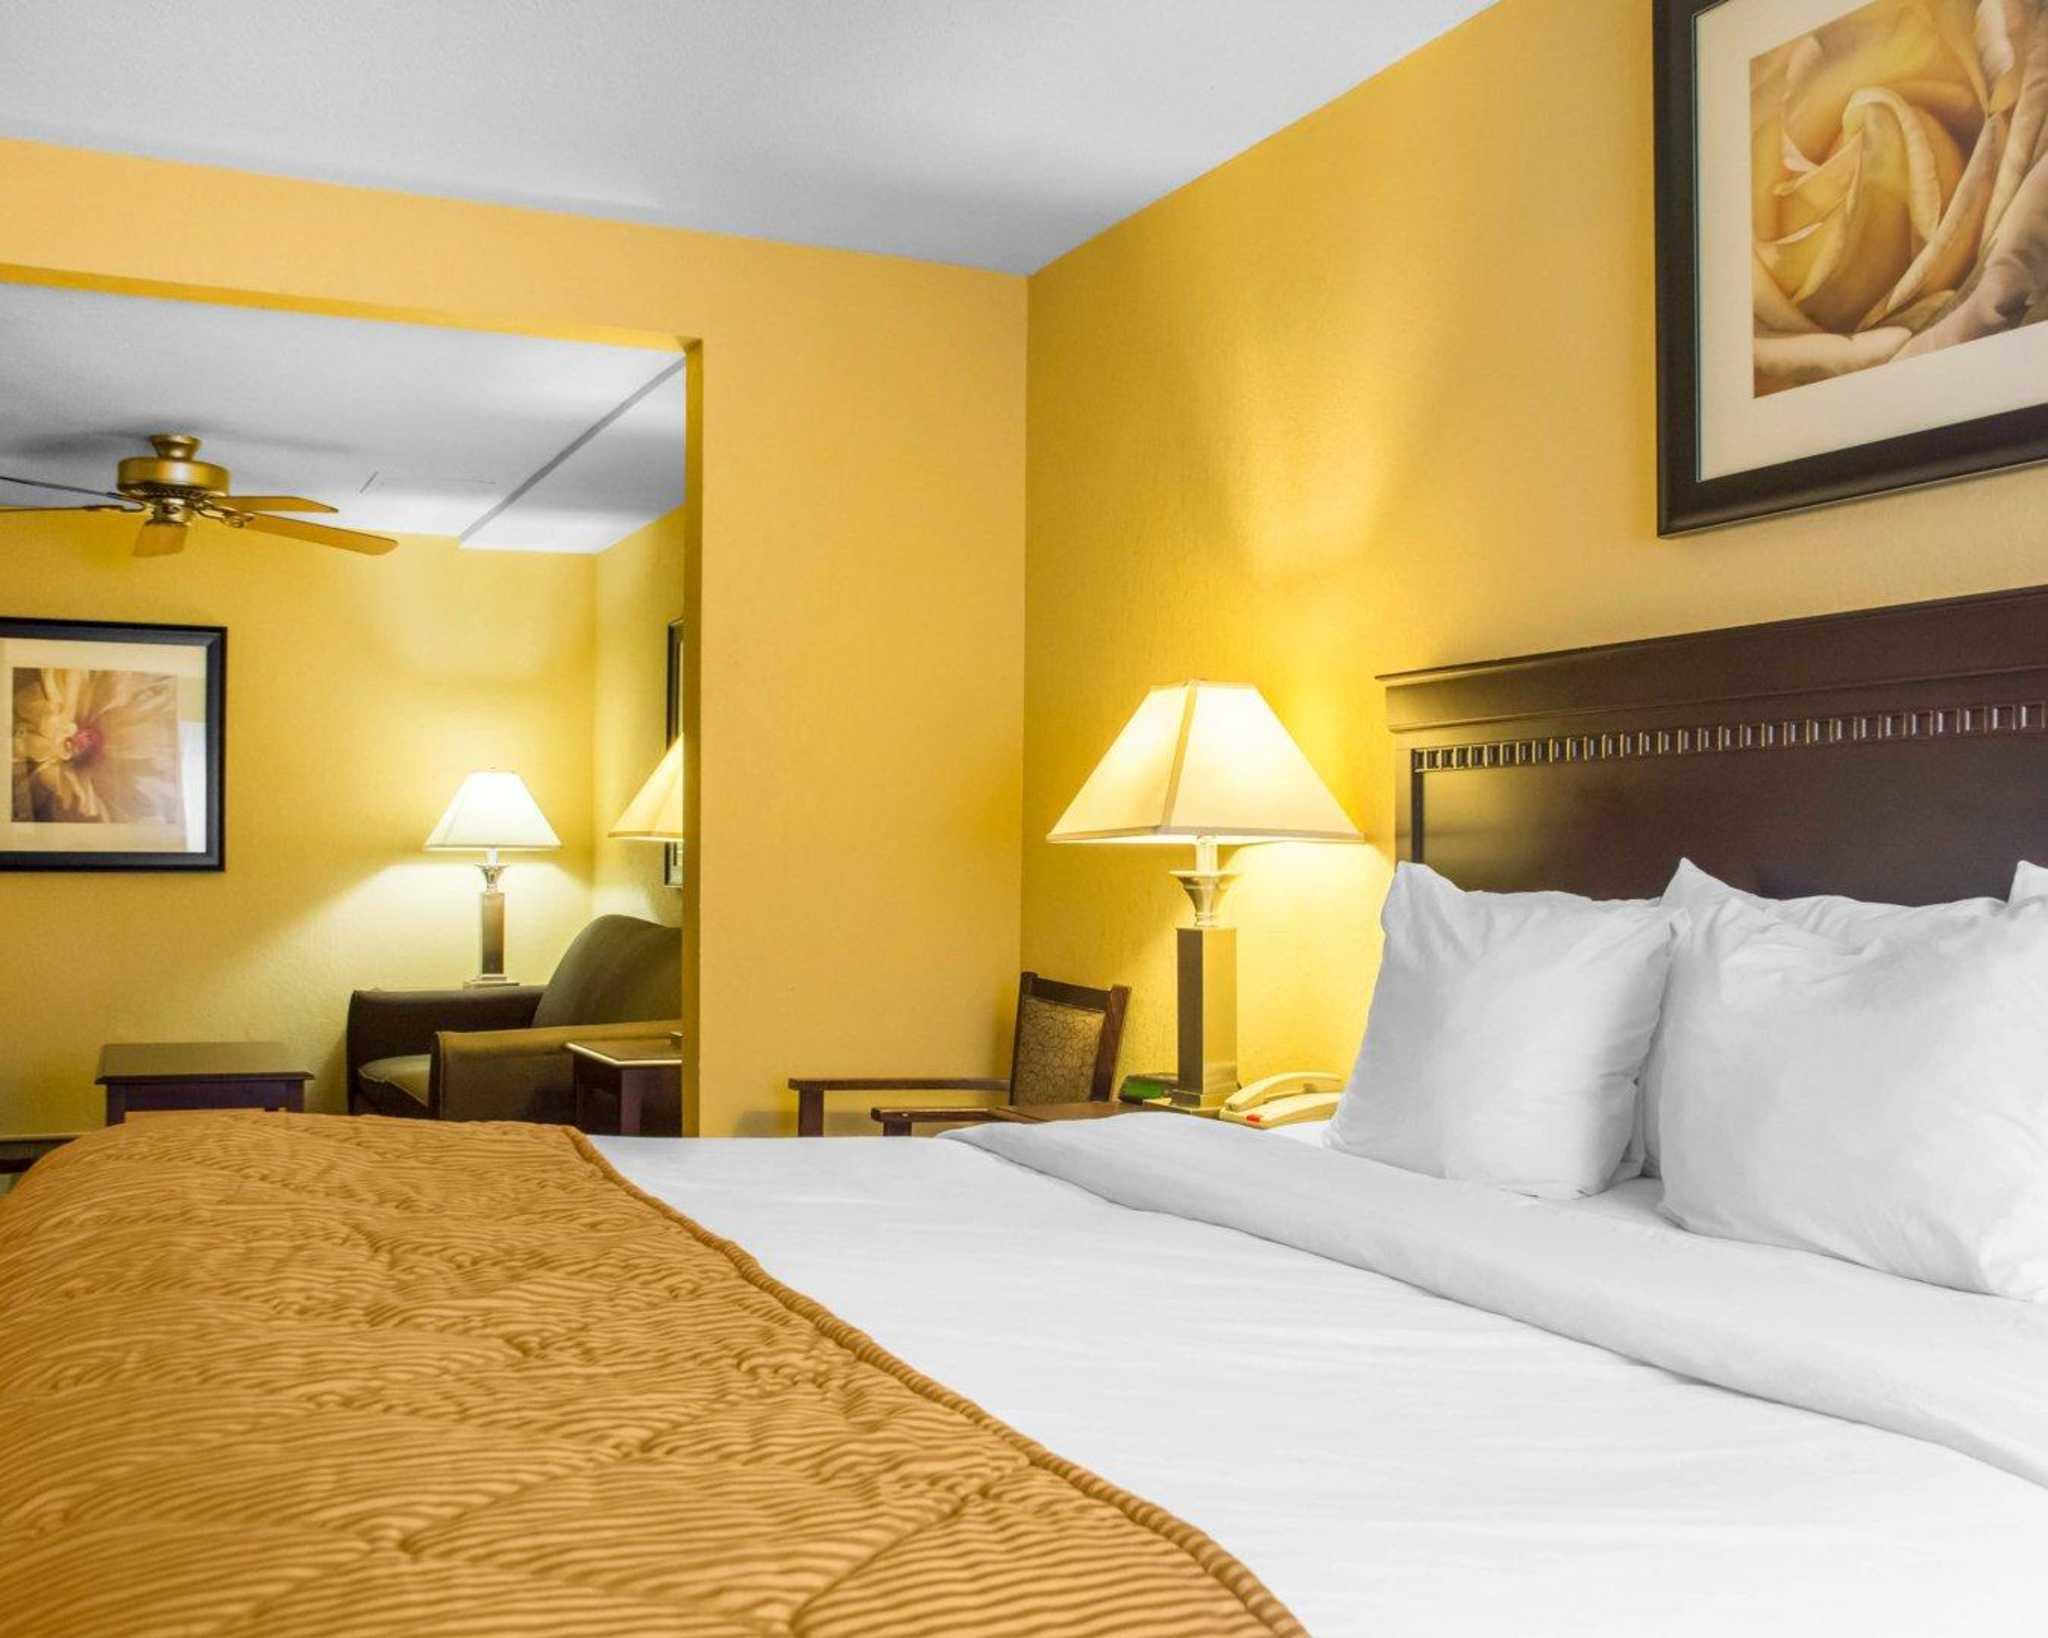 Quality Inn & Suites Fairgrounds image 14